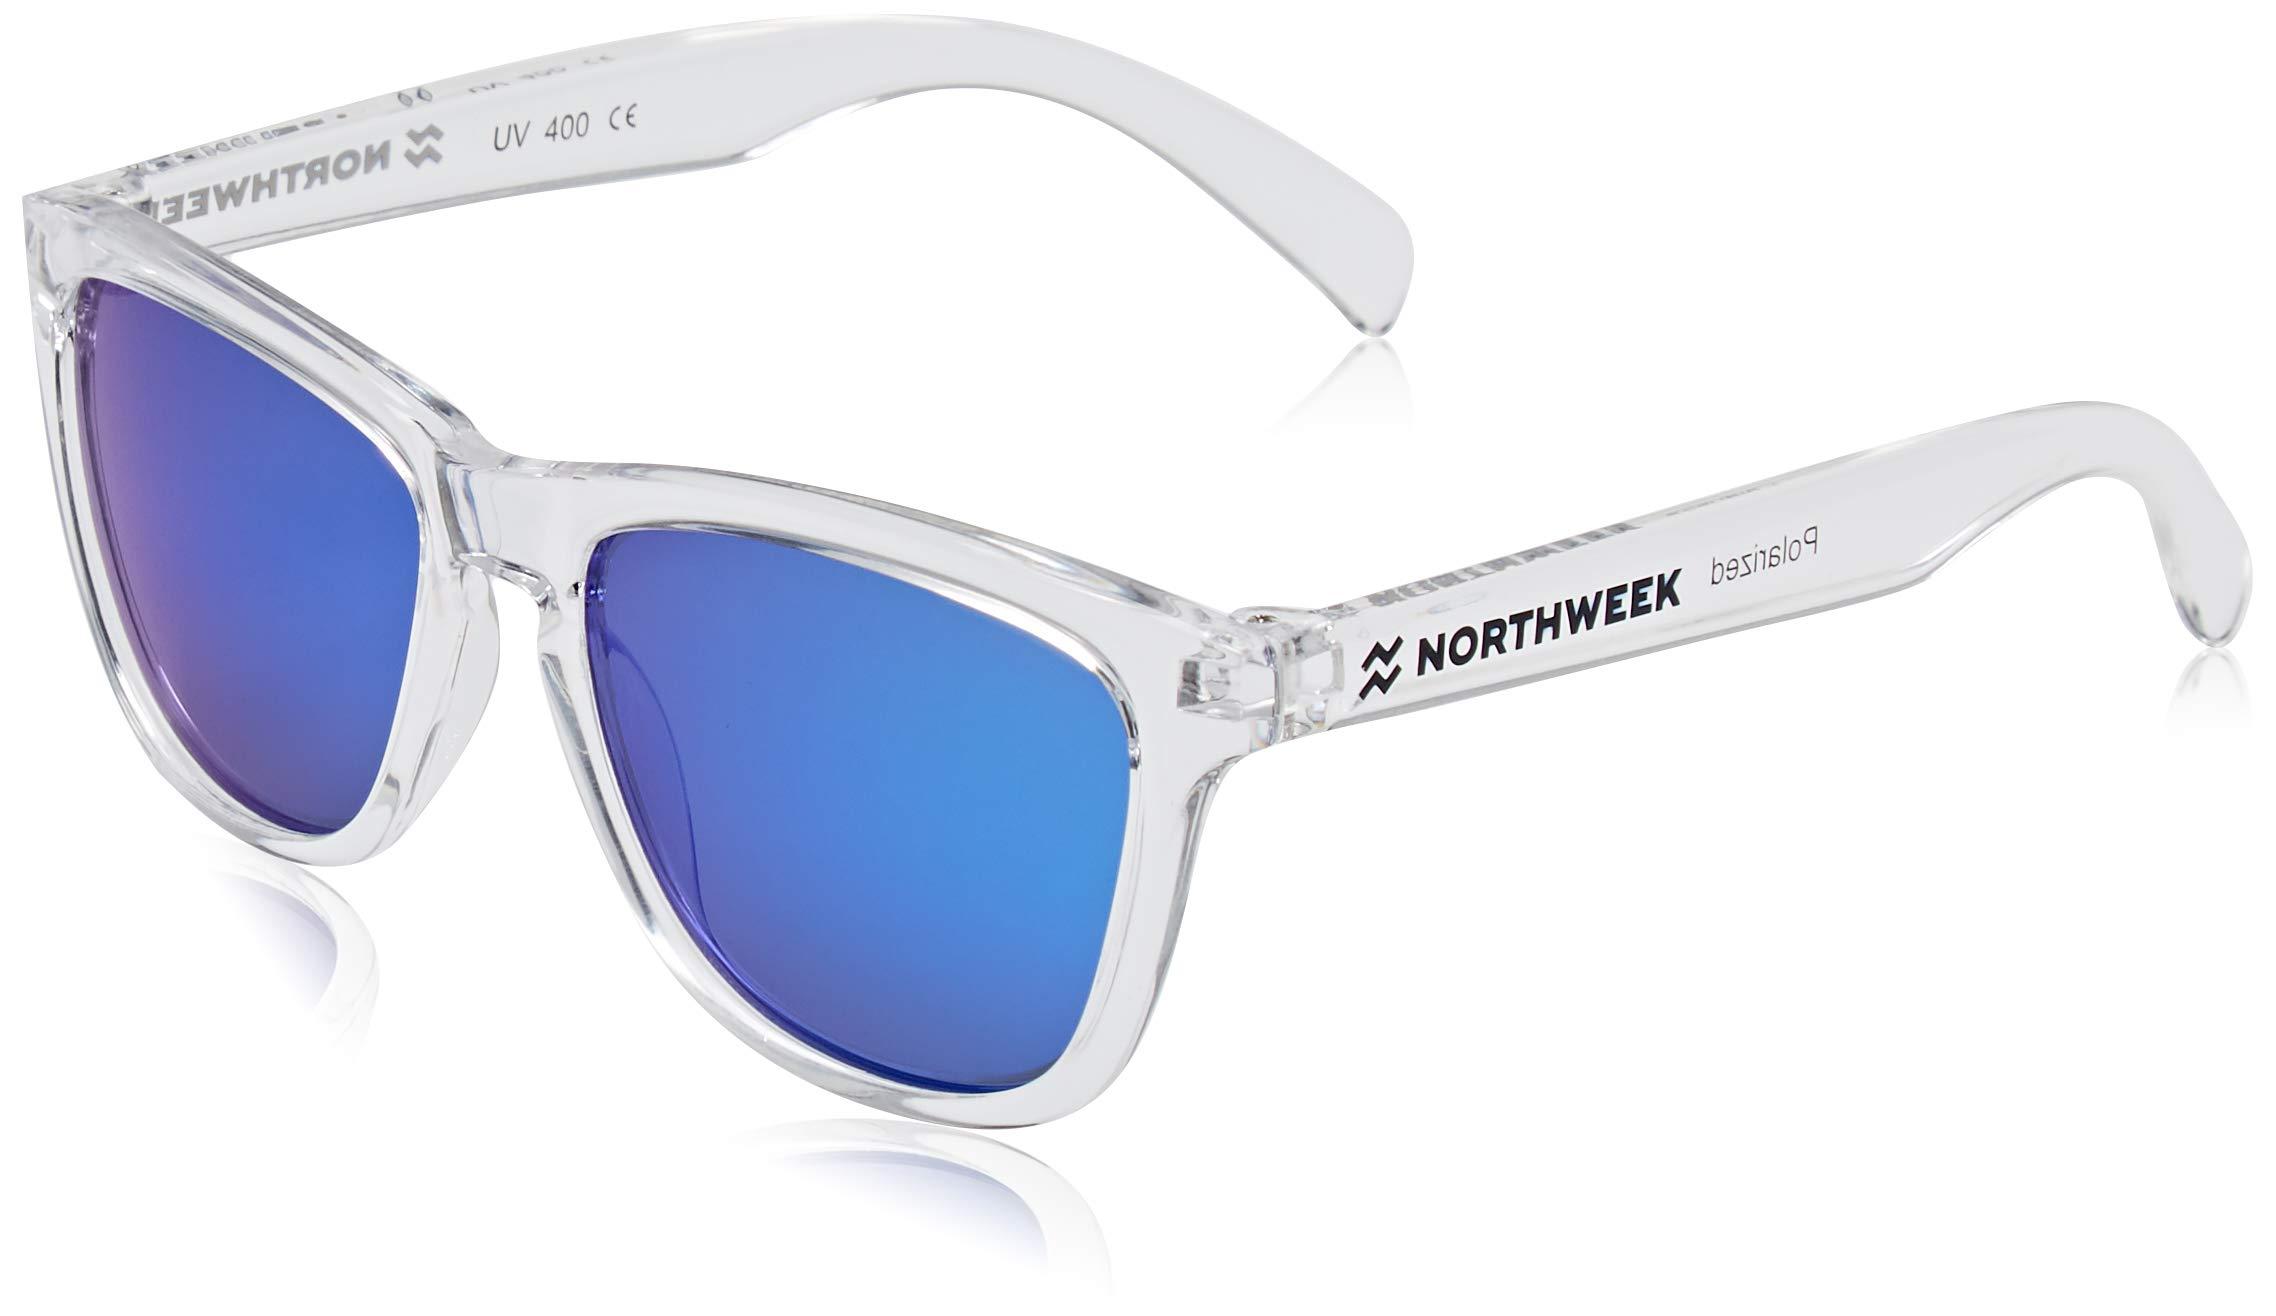 NORTHWEEK Kids Seabright - Gafas de Sol para Niño y Niña, Polarizadas, Translúcido/Azul 1